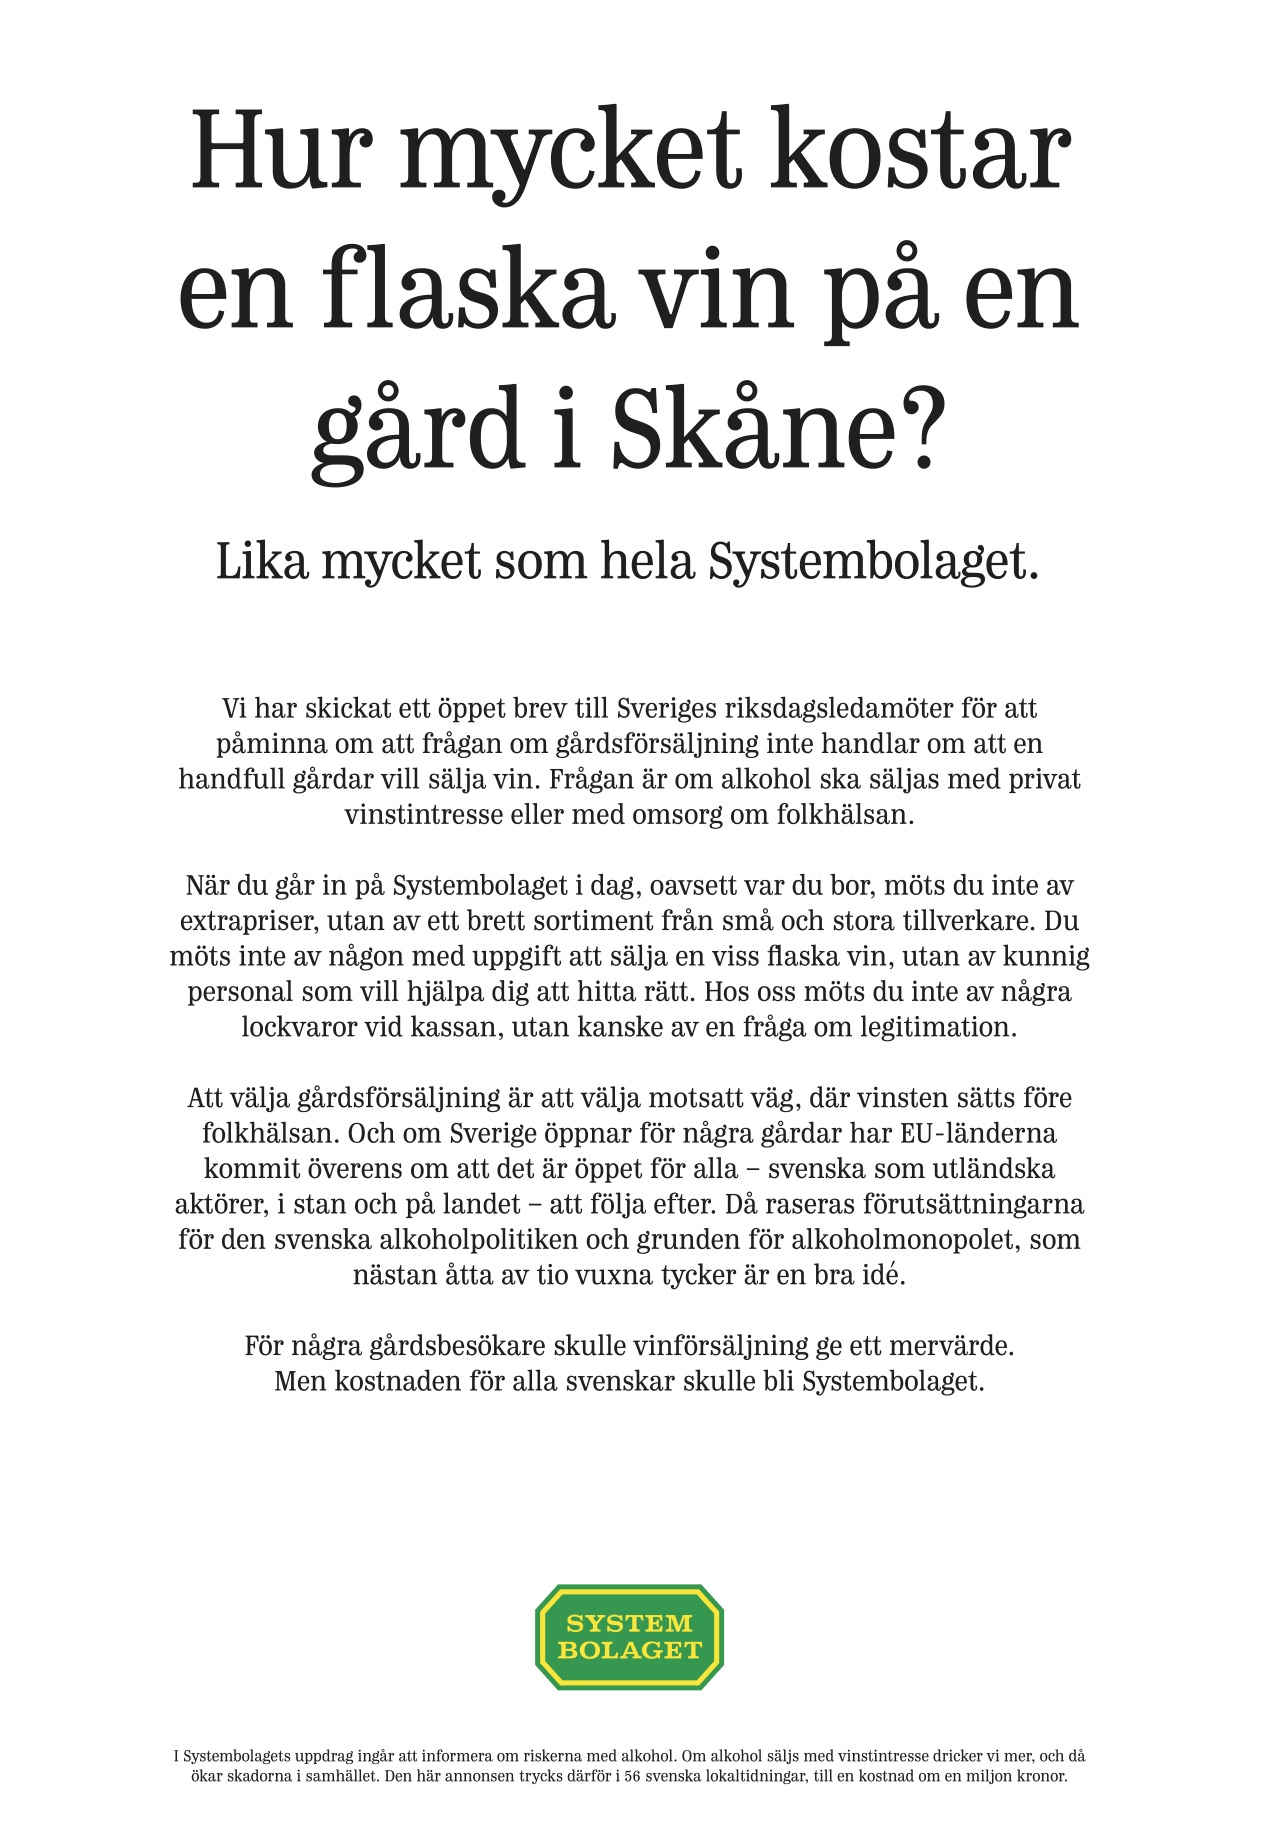 Ratt prat ska salja svensk mat